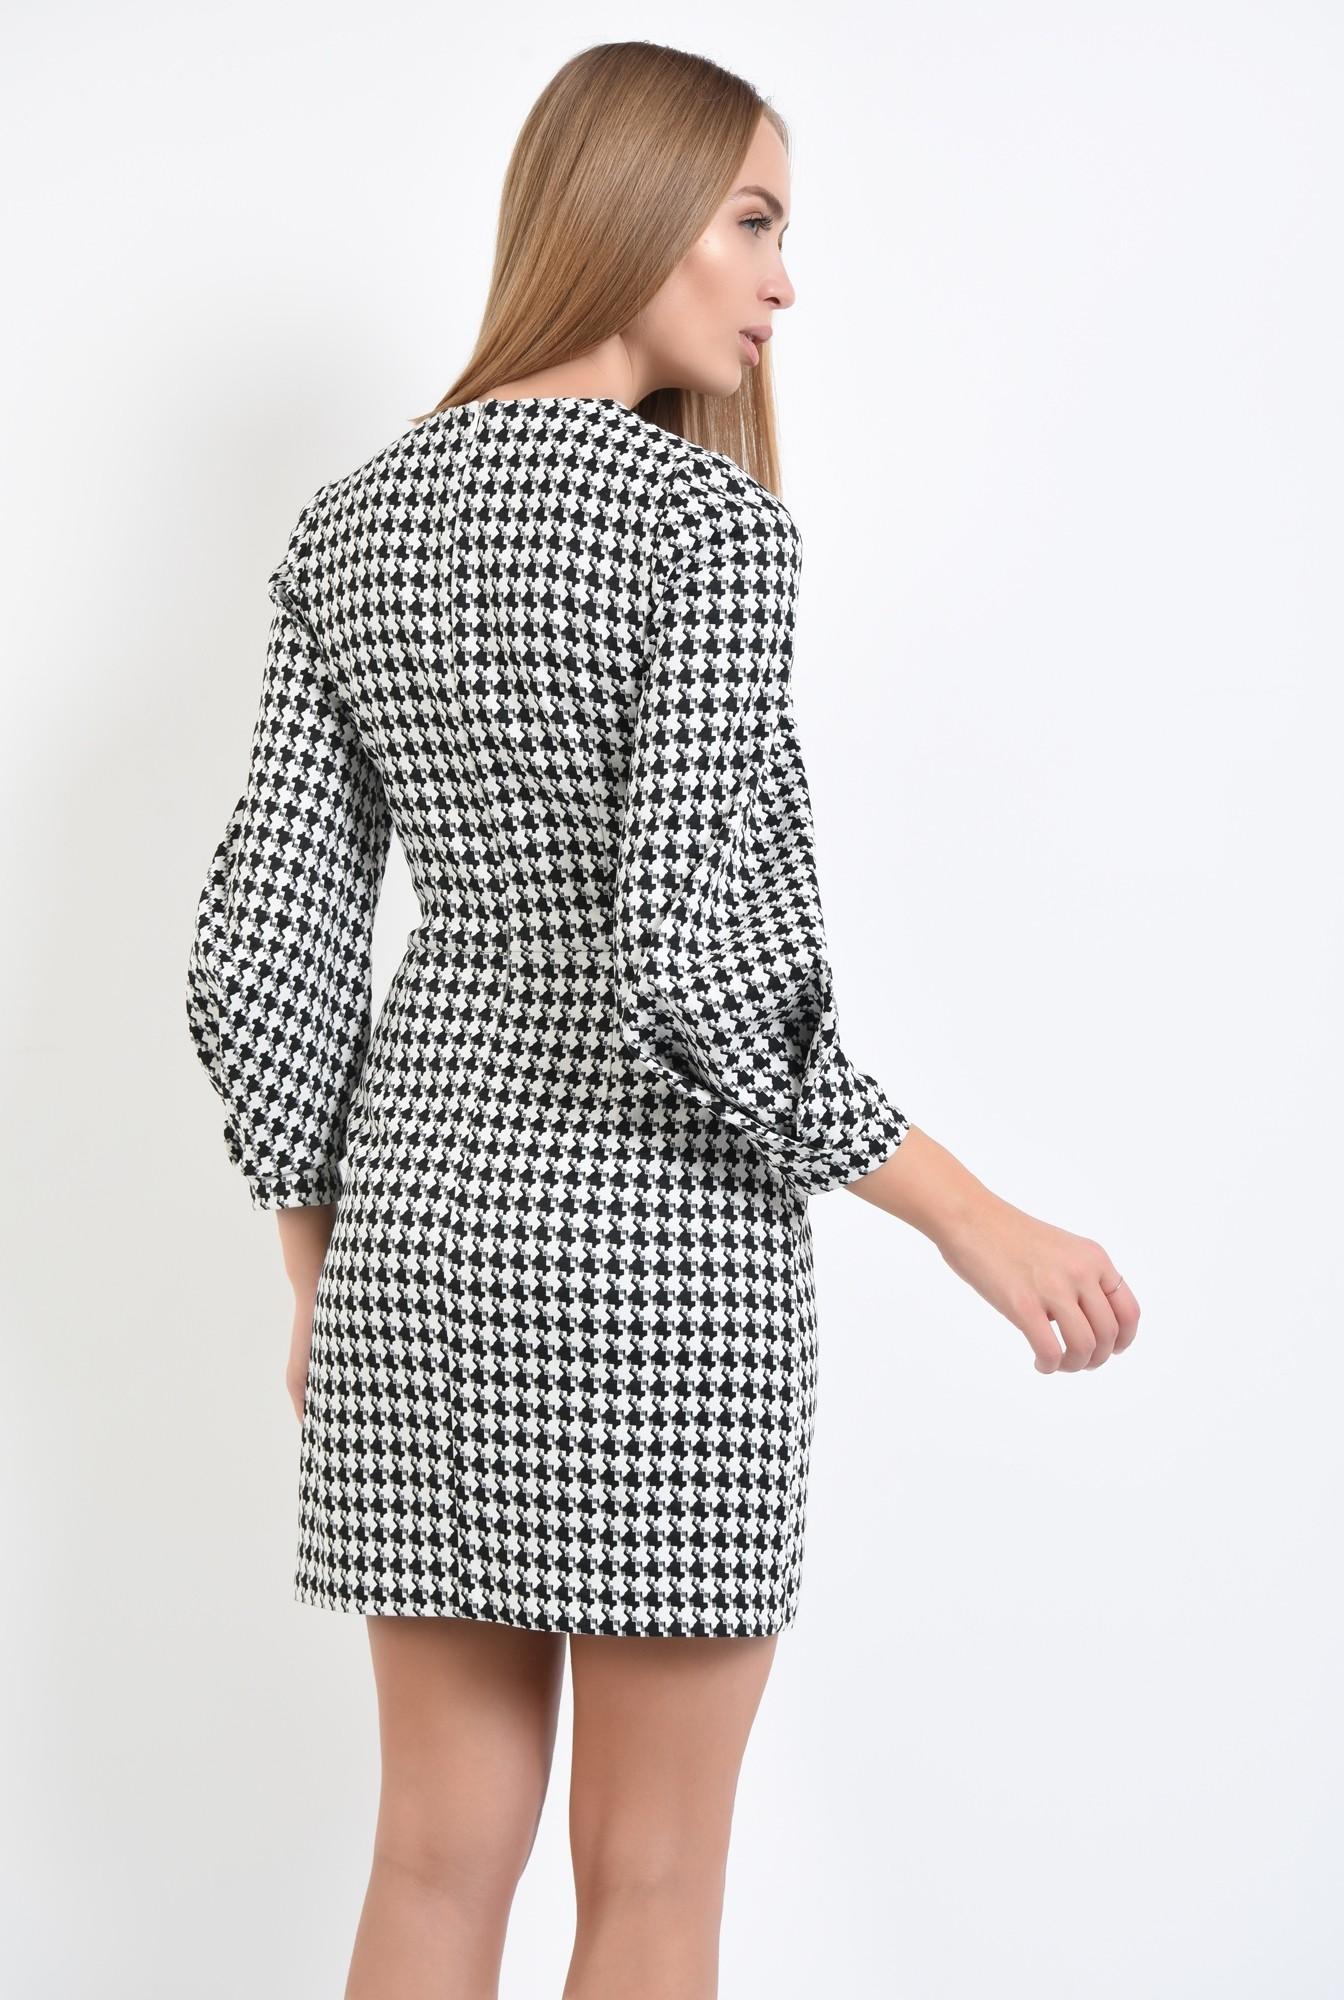 1 - rochie de zi, alb-negru, croi conic, mini